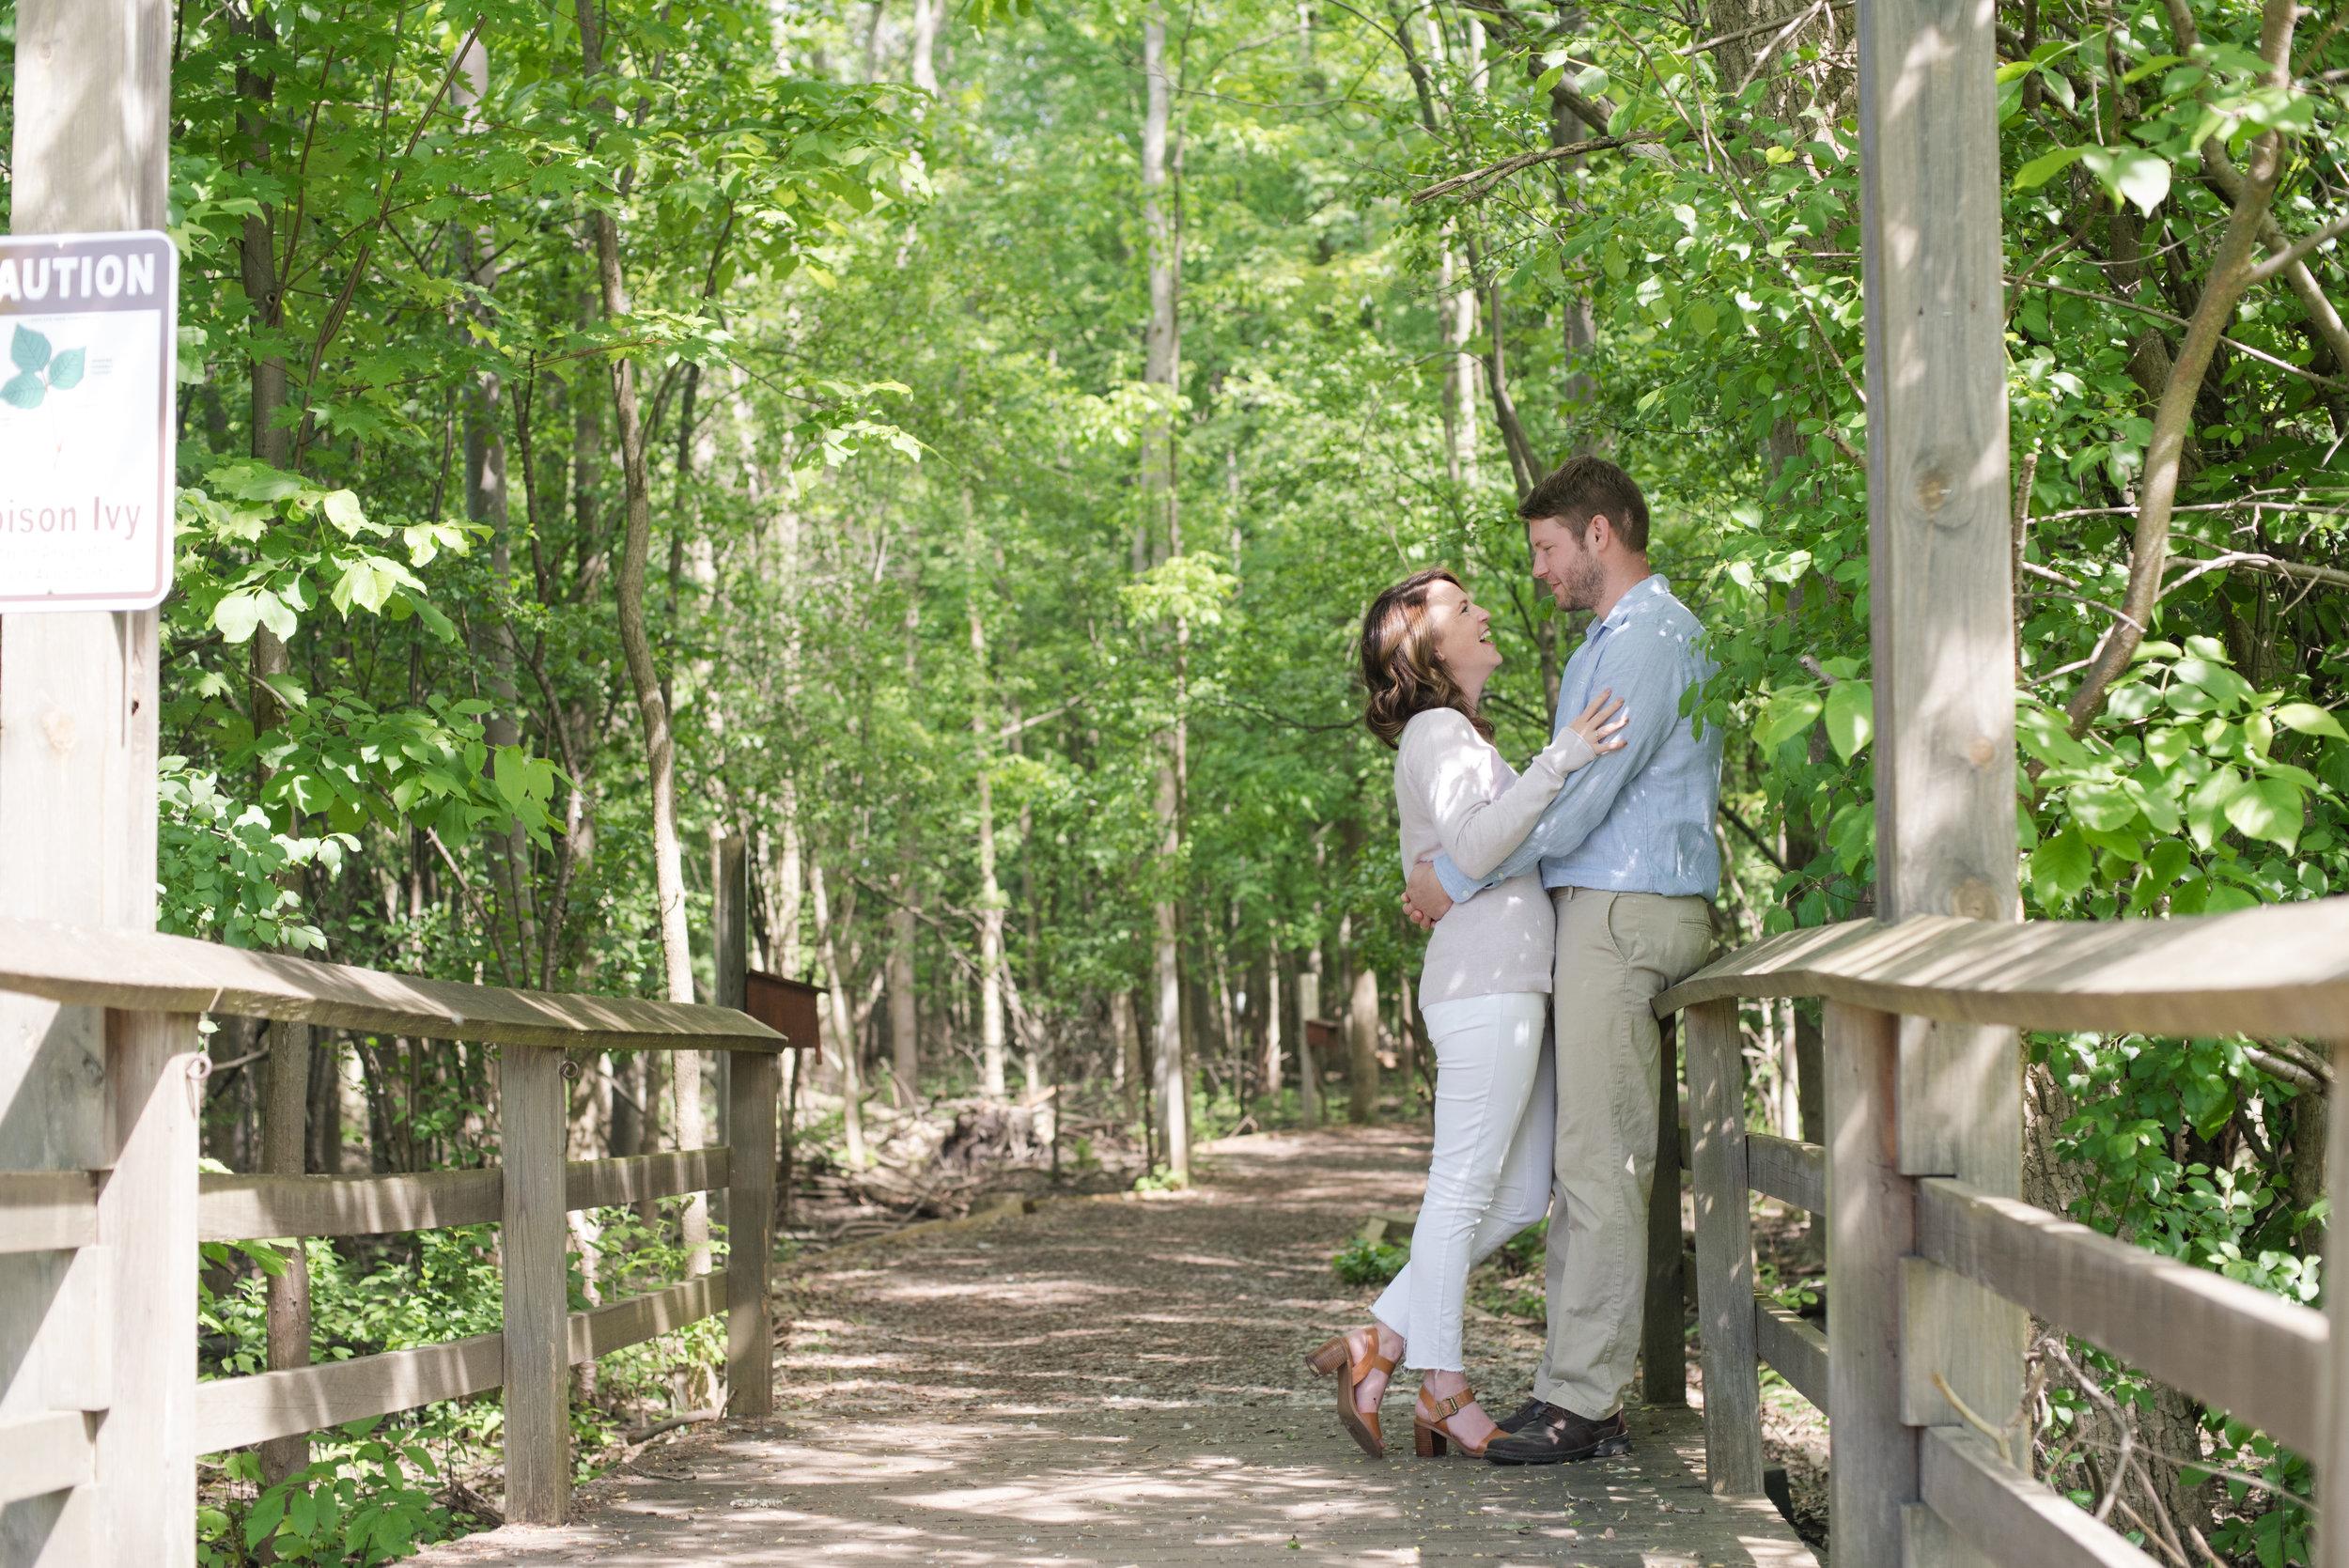 GALLERY-2019-6-9 Kaitlin, Justin & Liam Engagement 0473 47.jpg